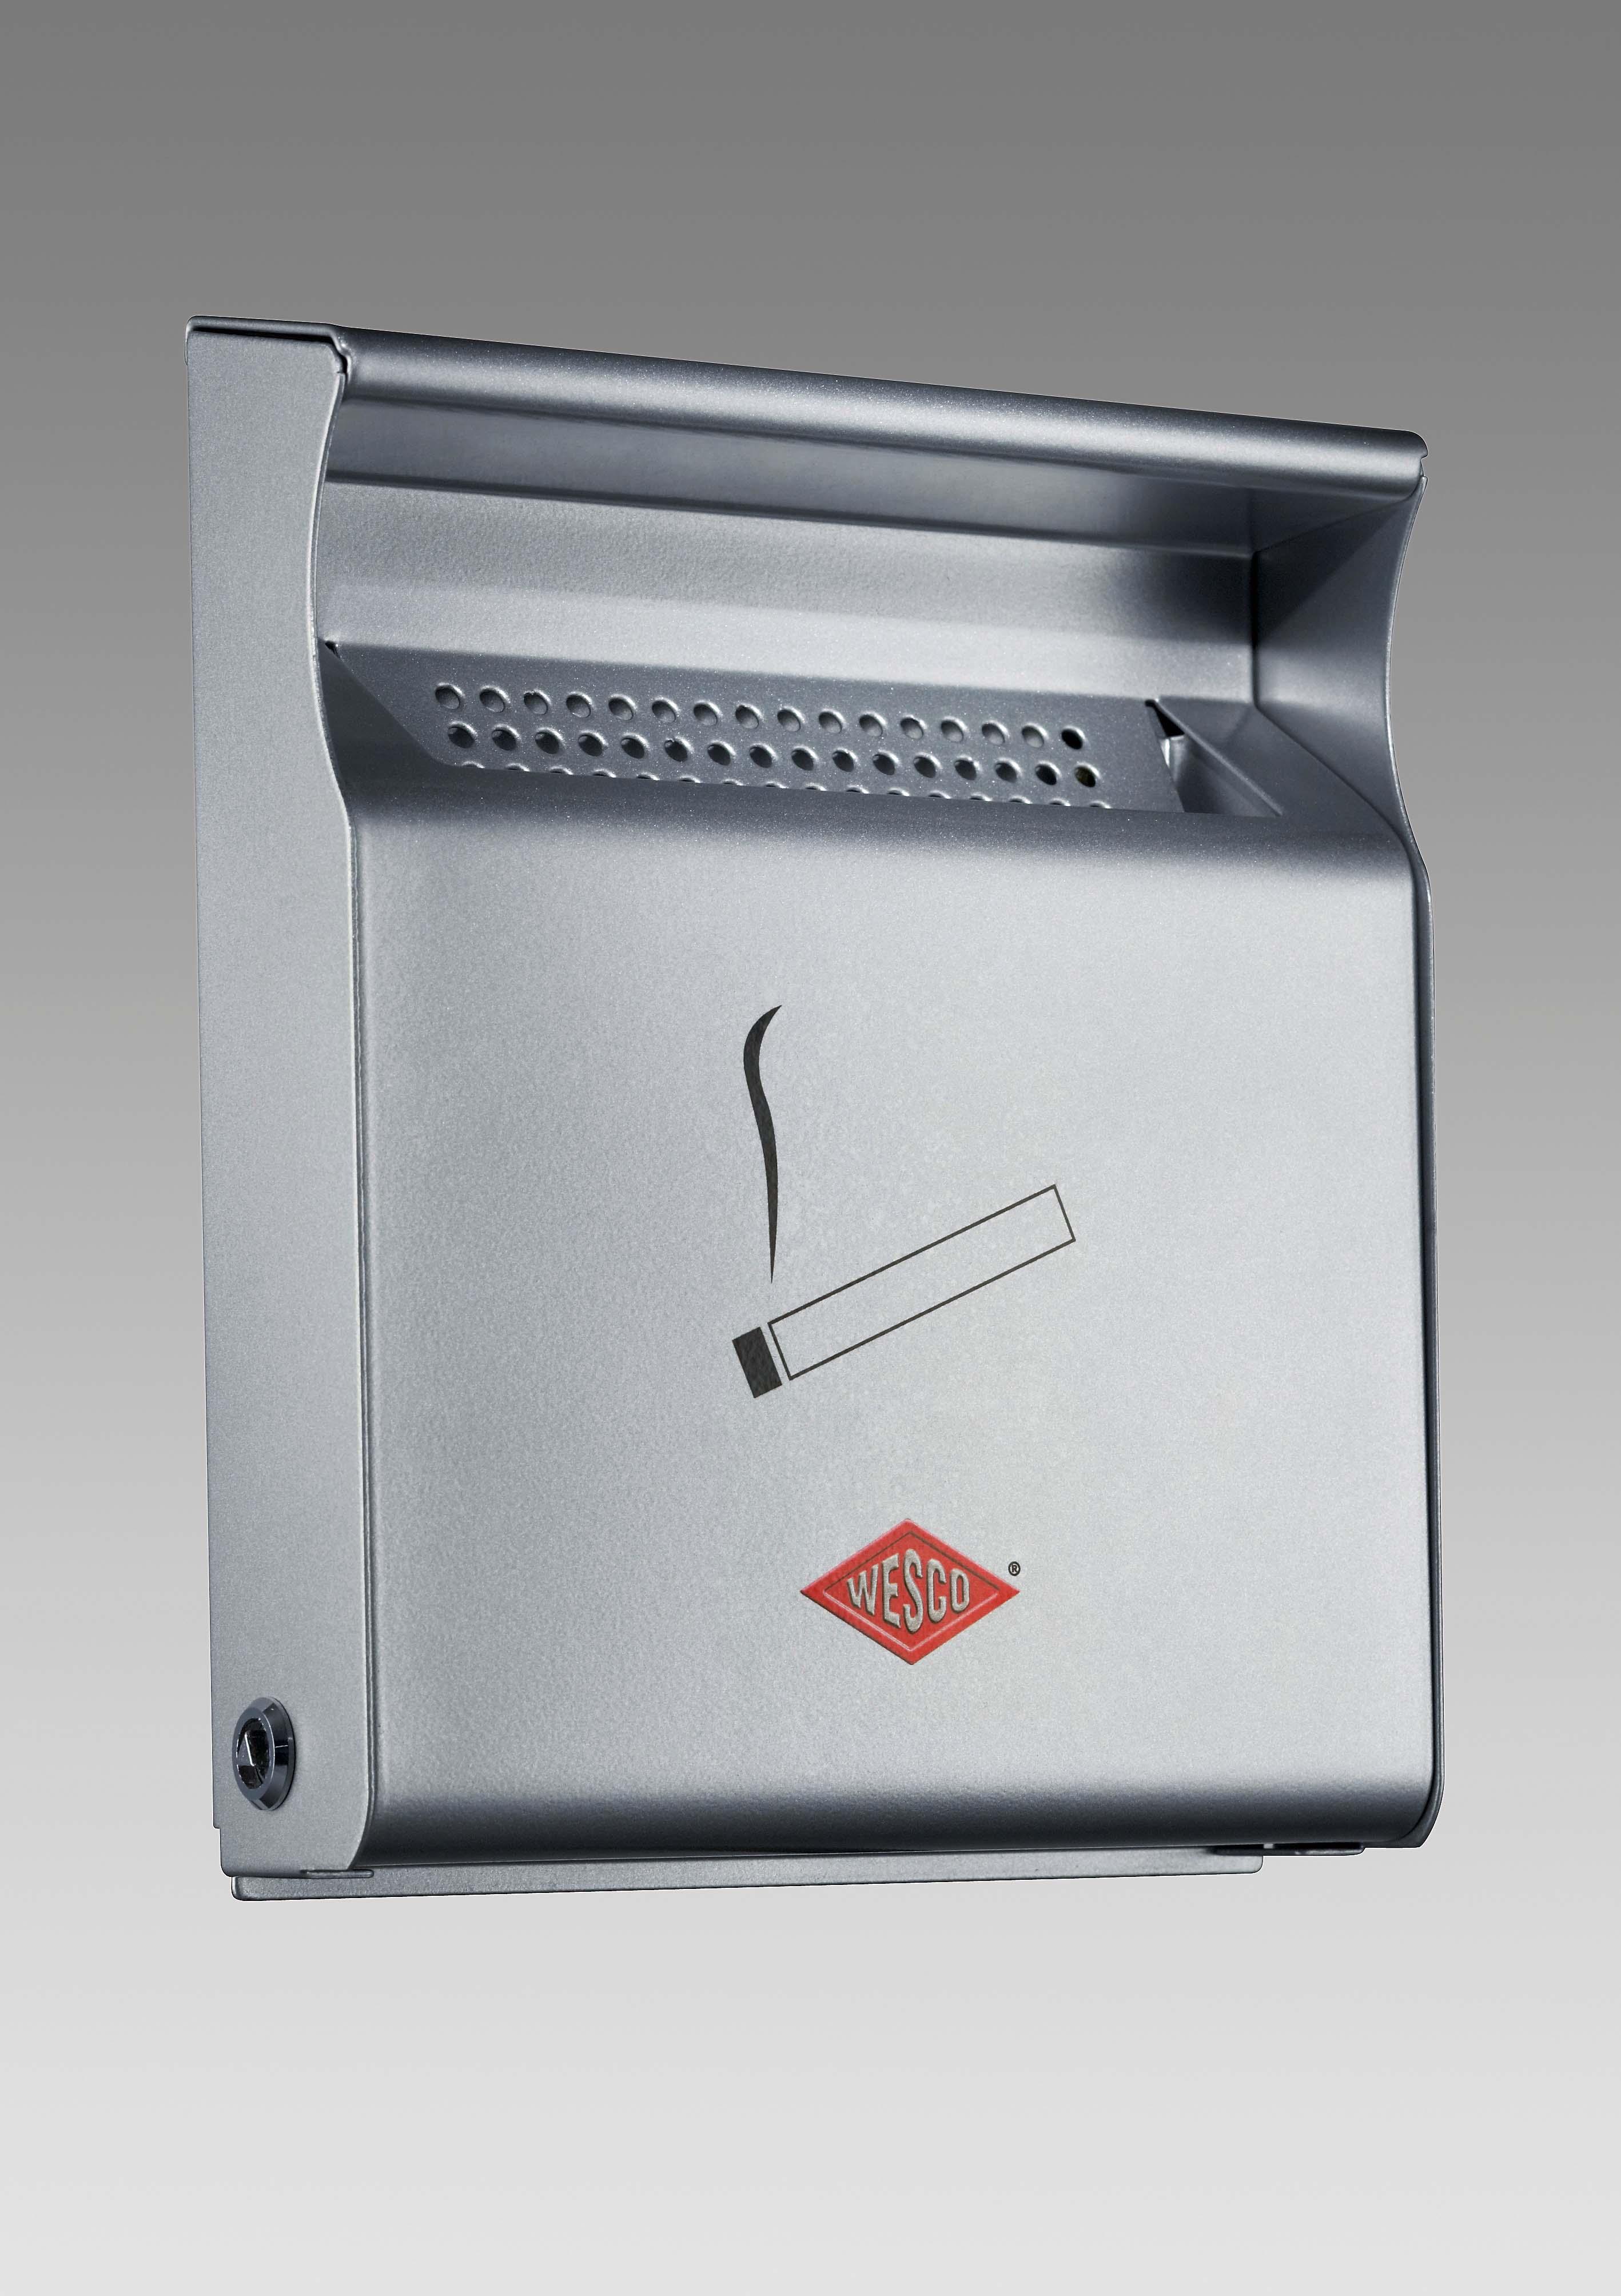 wesco wand aschenbecher wandascher ashtray smokers line. Black Bedroom Furniture Sets. Home Design Ideas